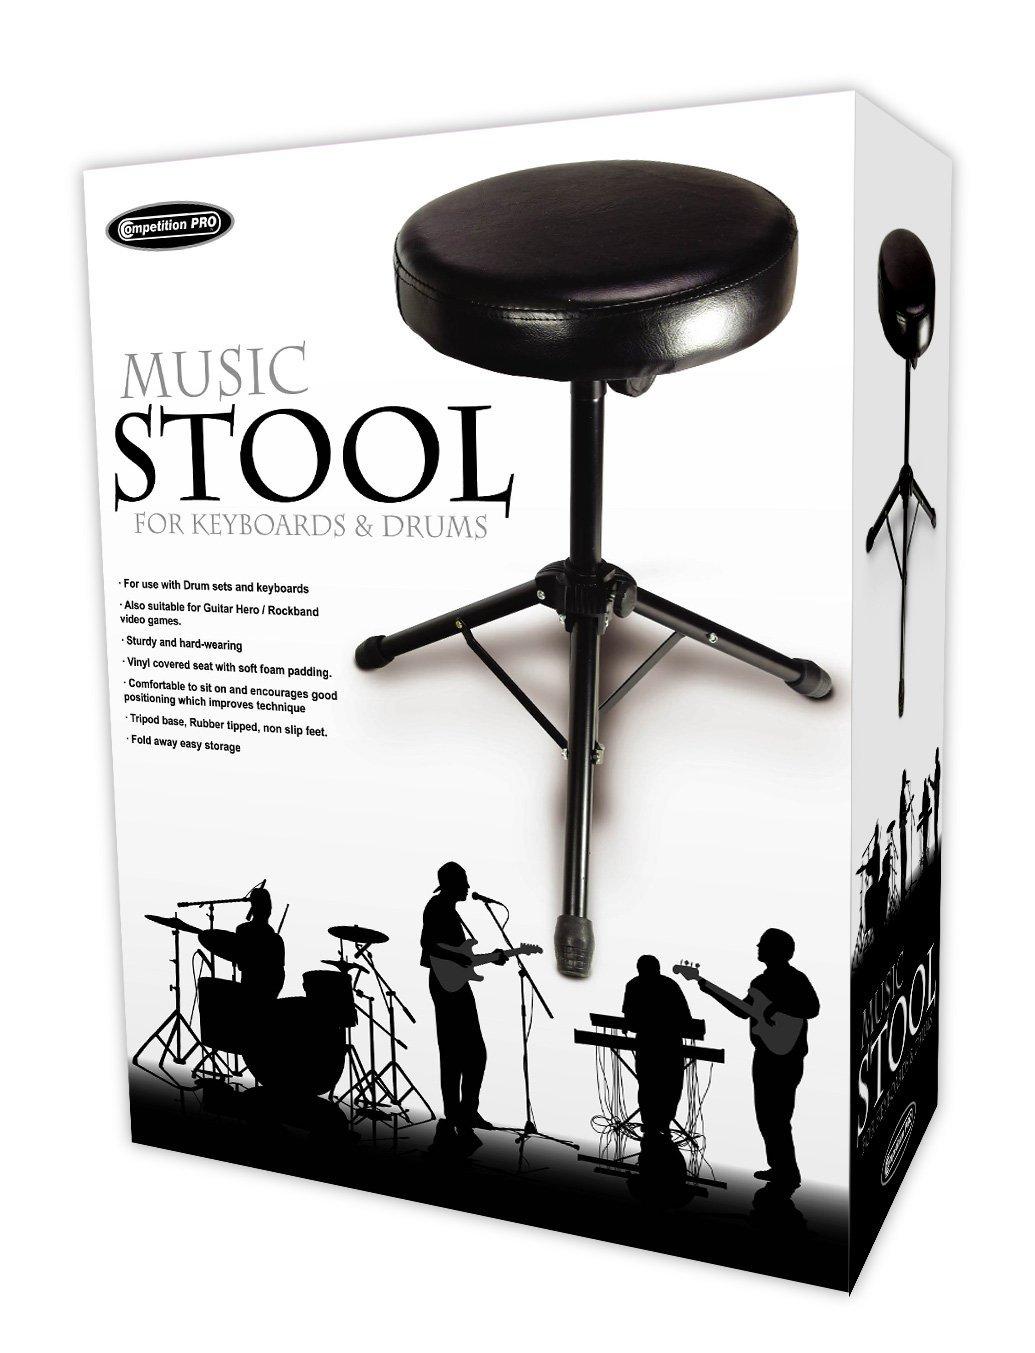 Competition Pro Multi Purpose Folding Music Stool